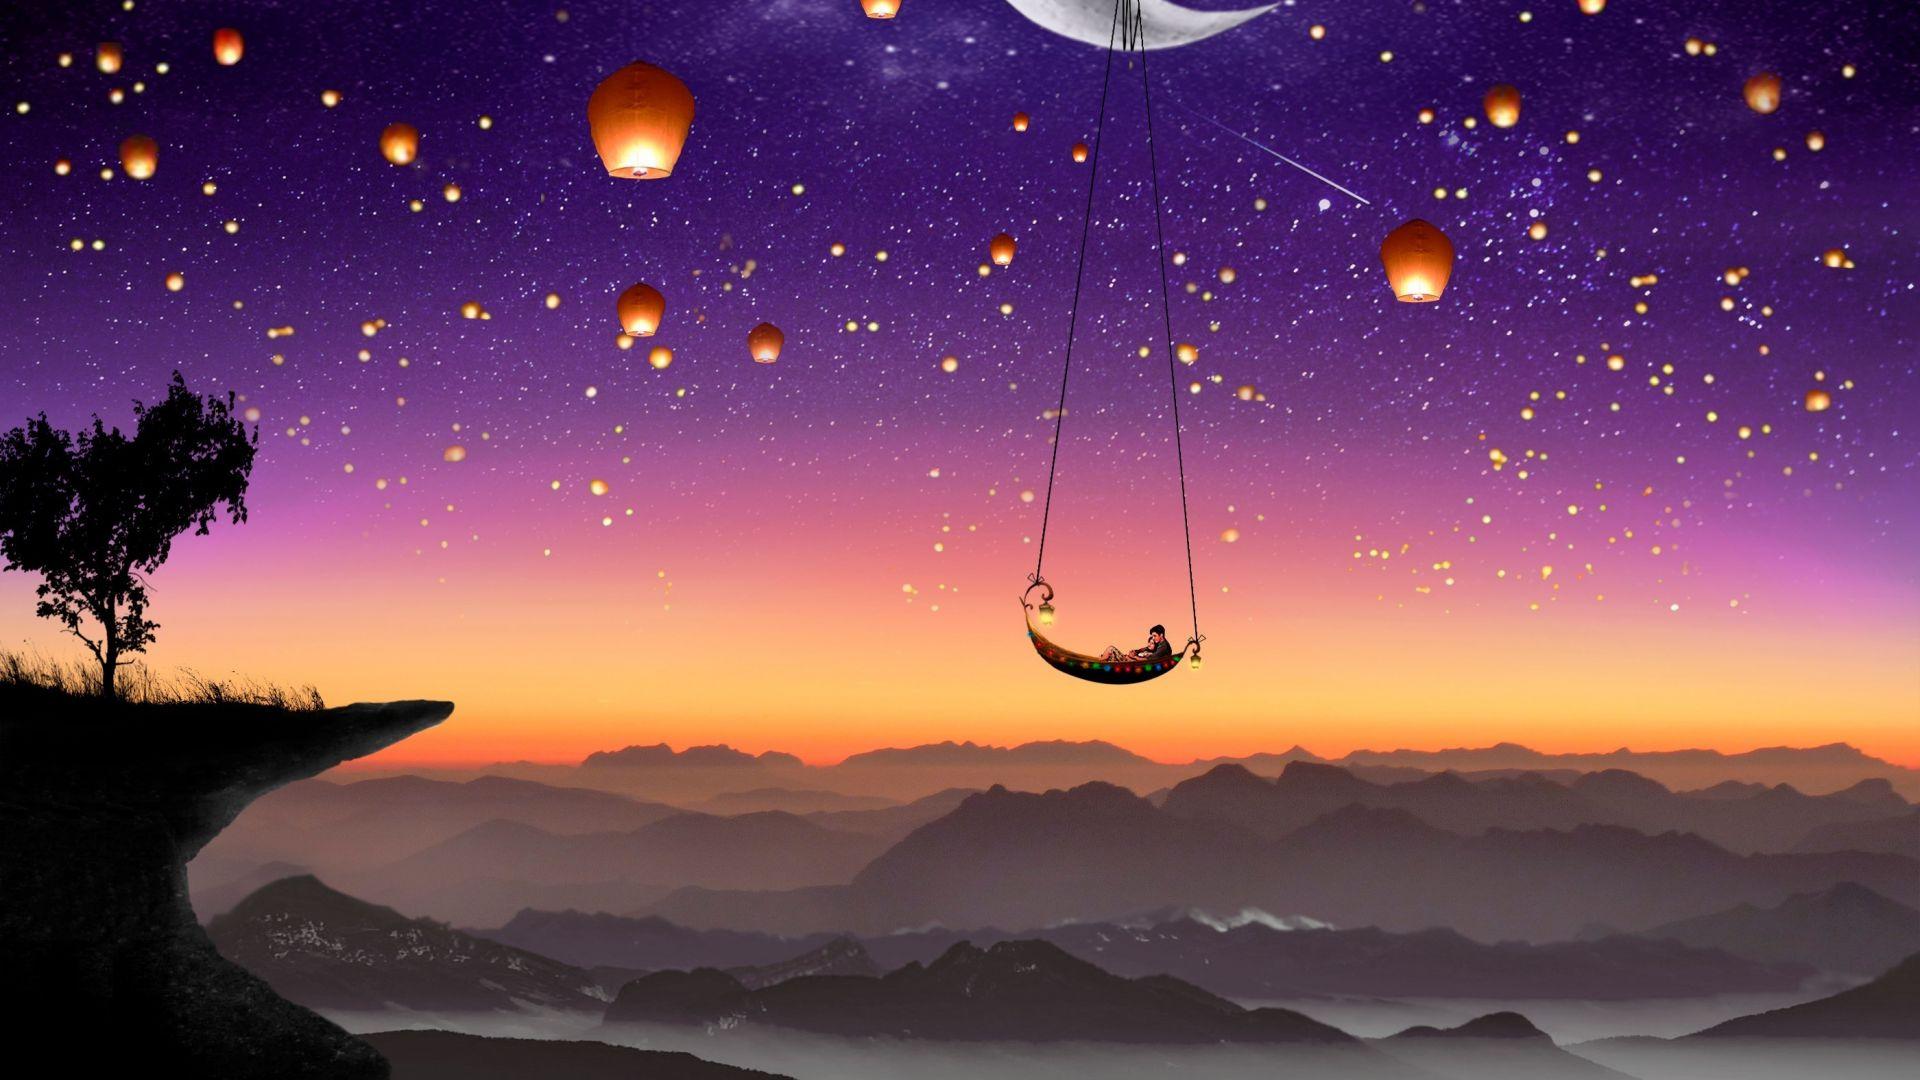 Best Wallpaper Night Lantern - couple-moon-lanterns  Best Photo Reference-737740.jpg